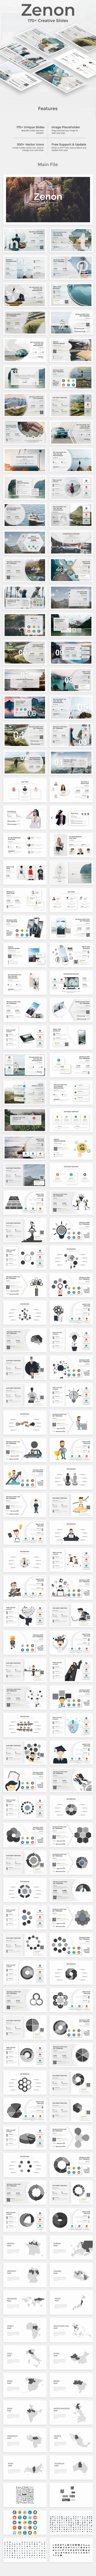 Zenon Creative Premium Powerpoint Template 170 Unique